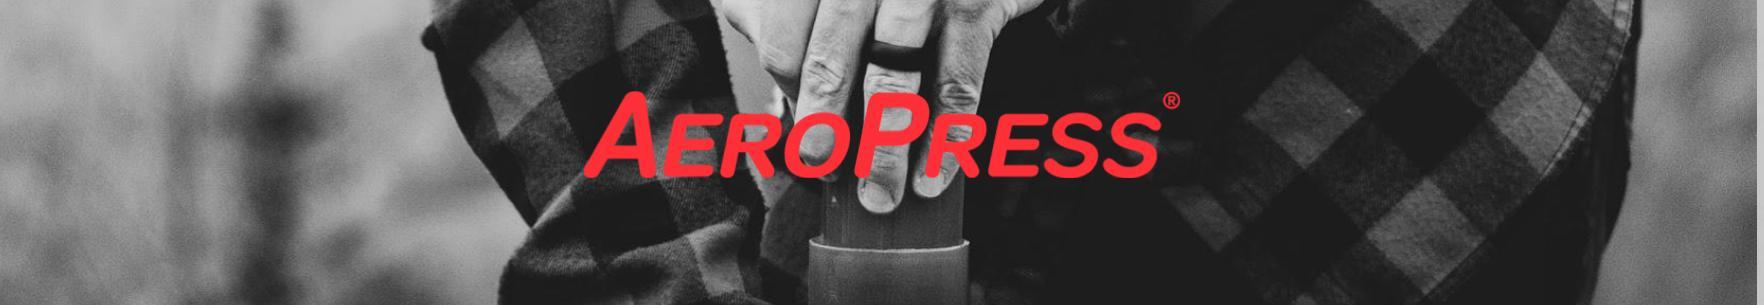 Aeropress produkter